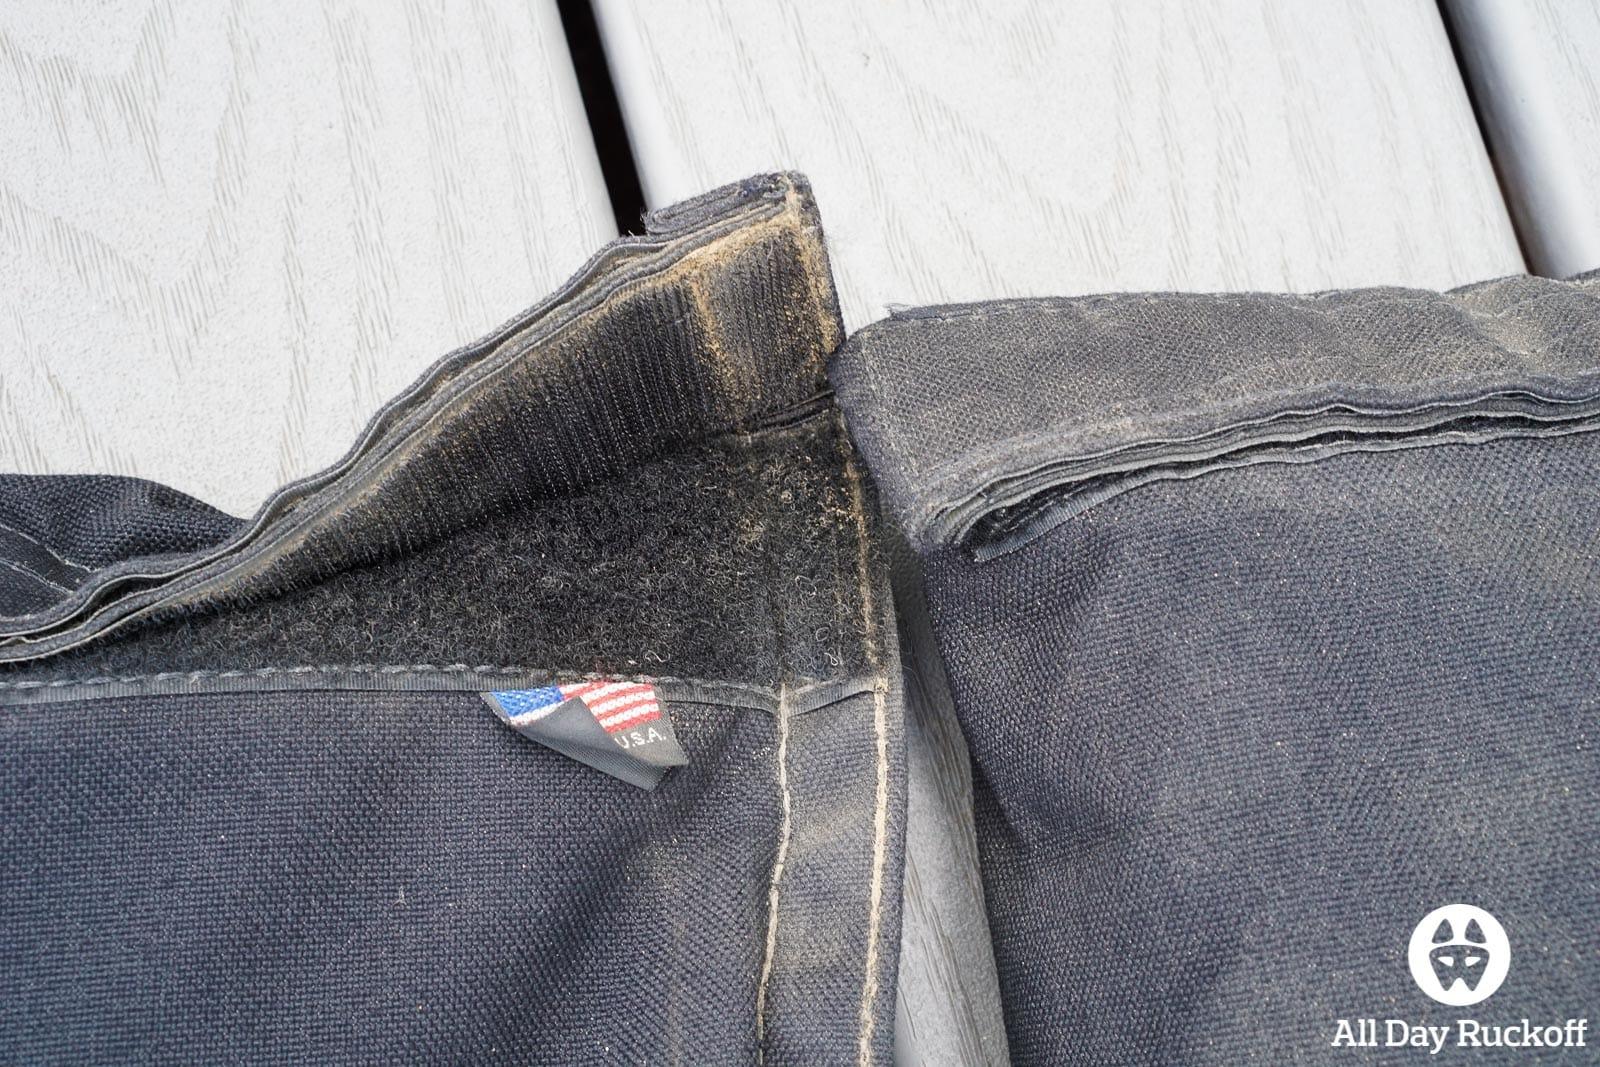 Brute Force Athlete Sandbag - Filler Bags Closure